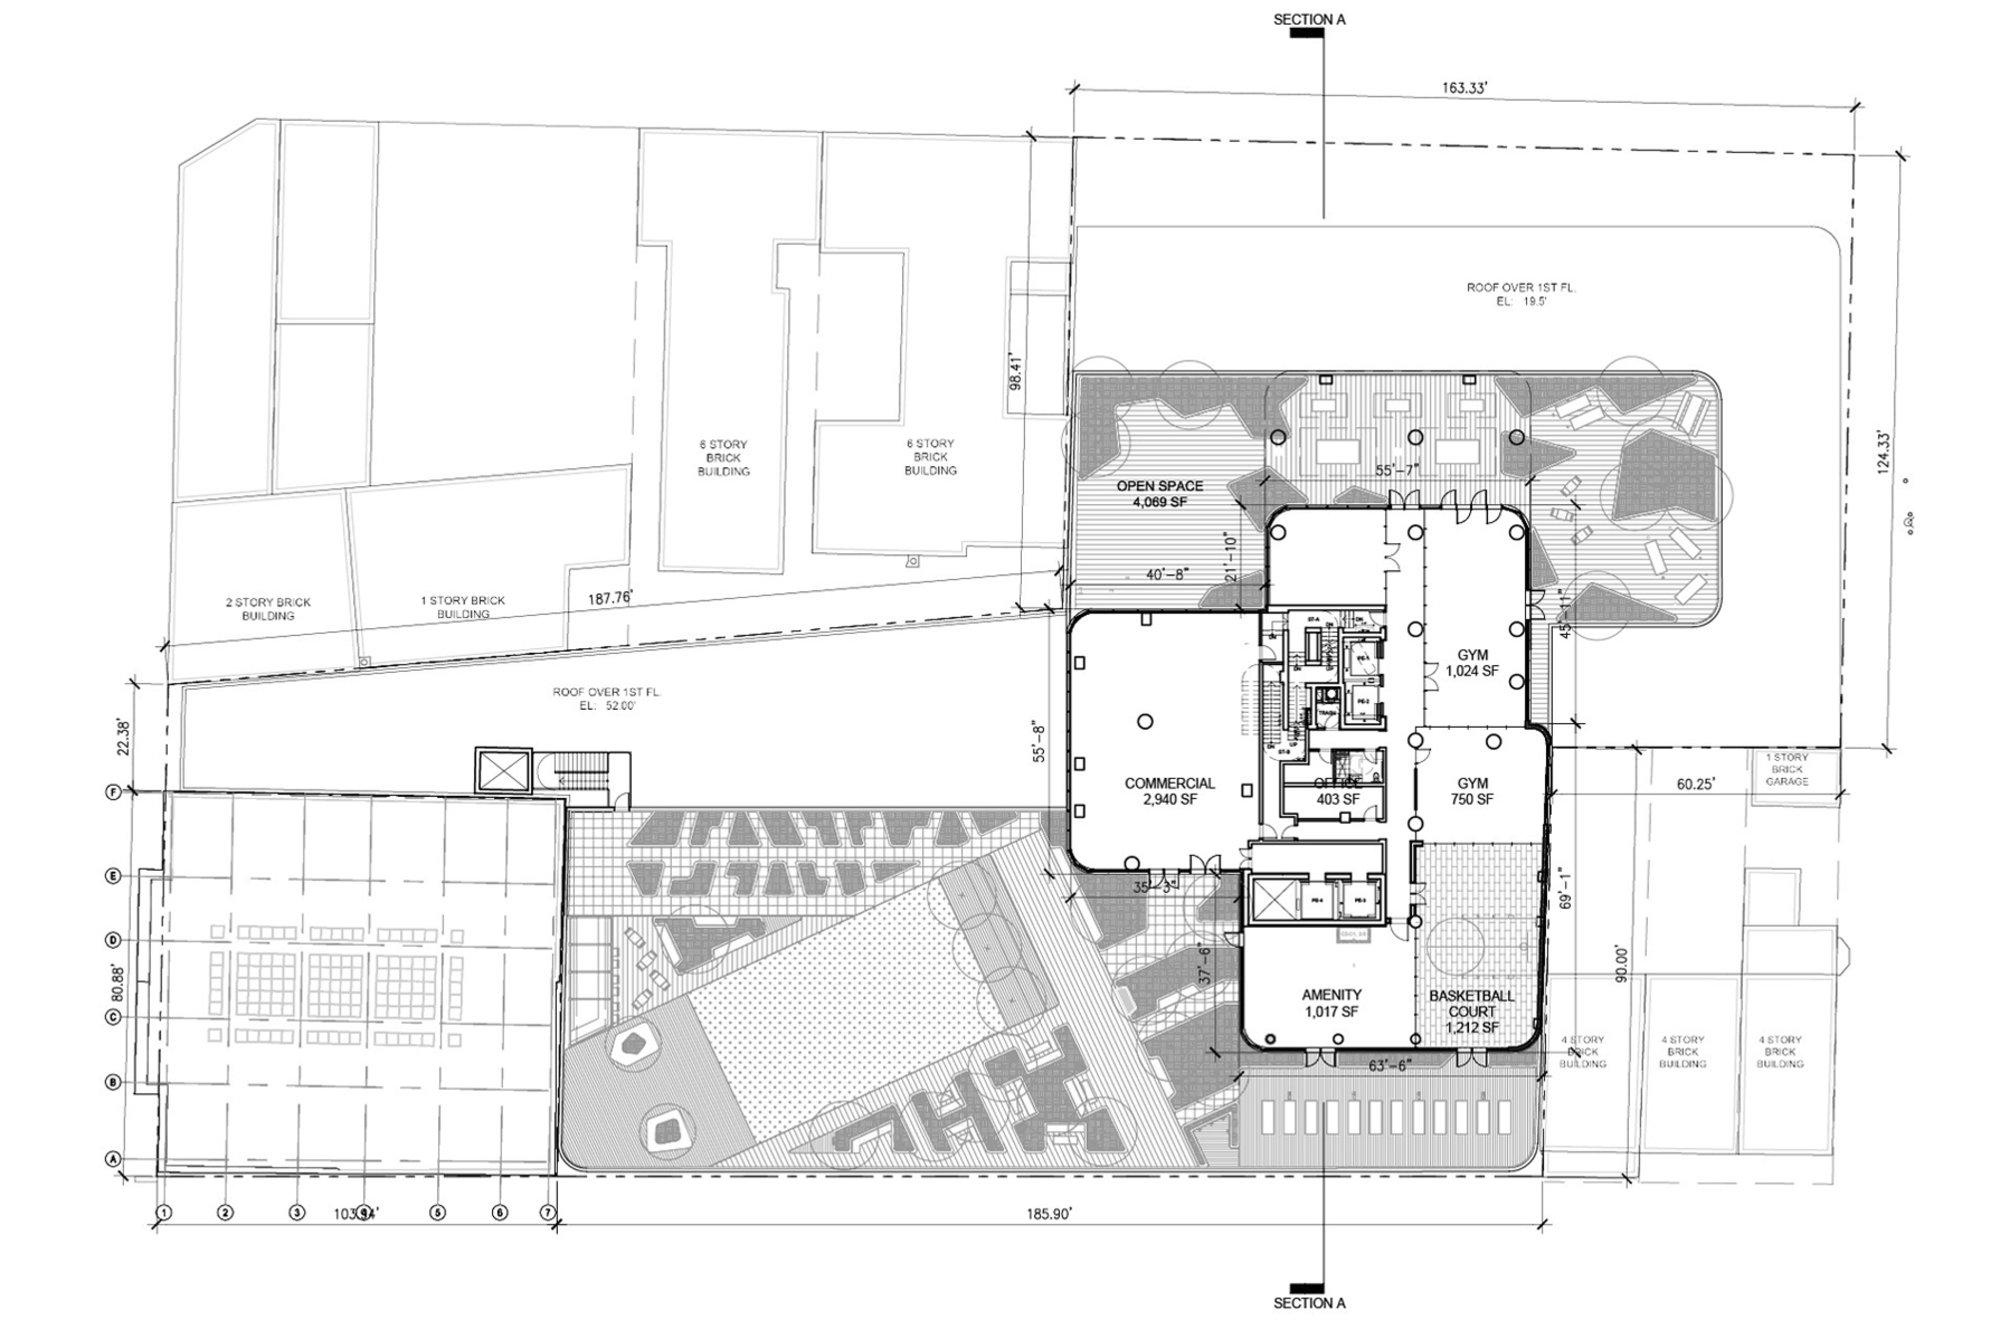 dime-plan-5th-floor-2